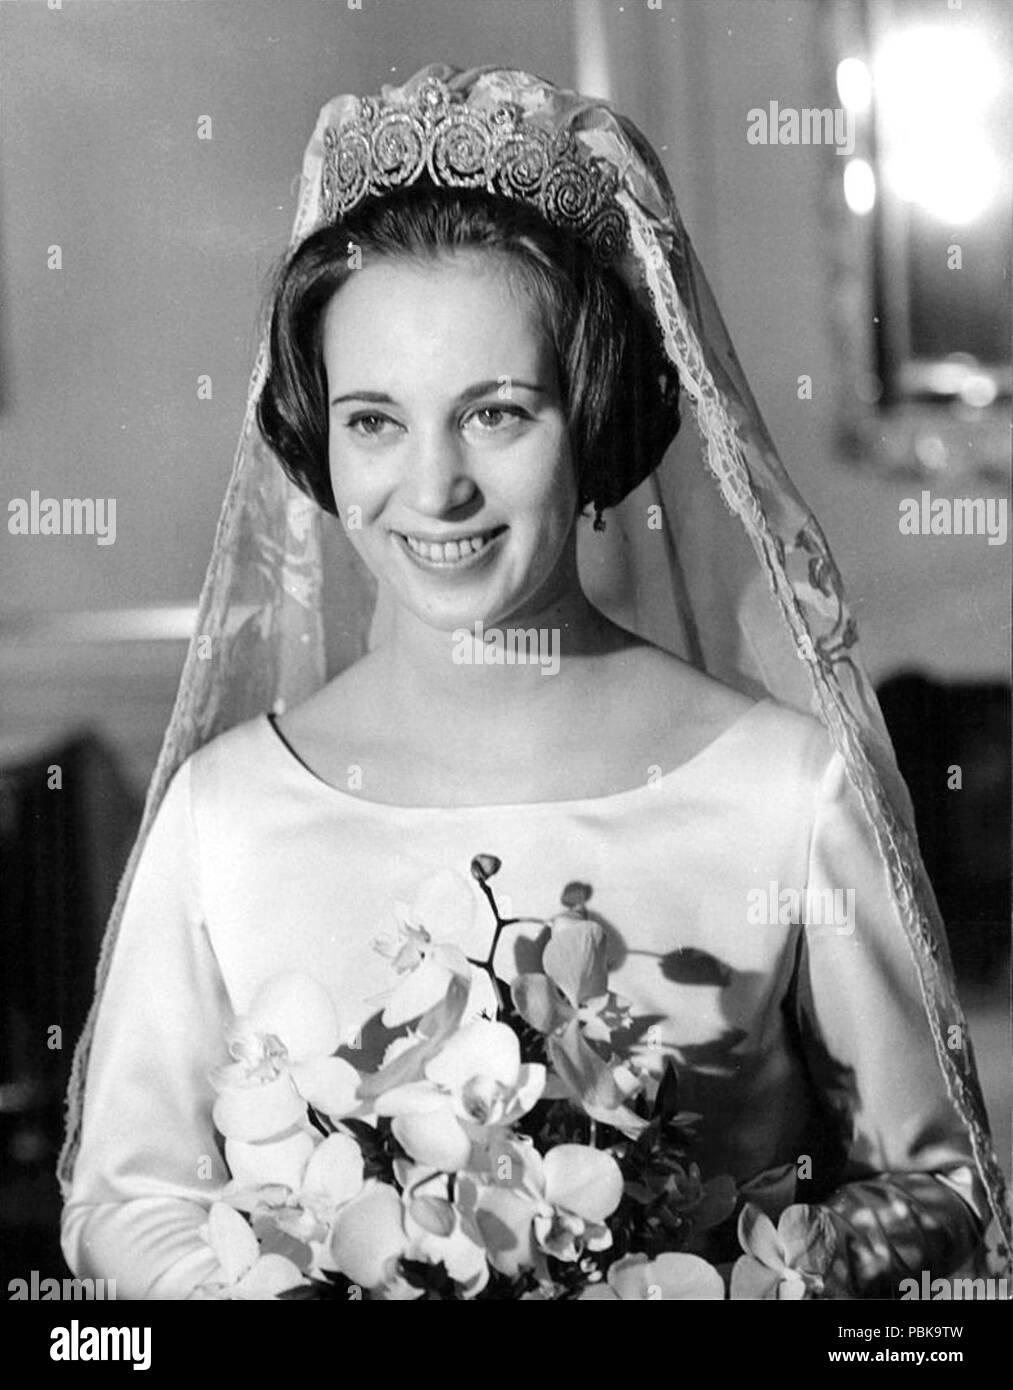 A-wedding-photo-of-Princess-Benedikte-of-Denmark-February-4-1968- - Stock Image